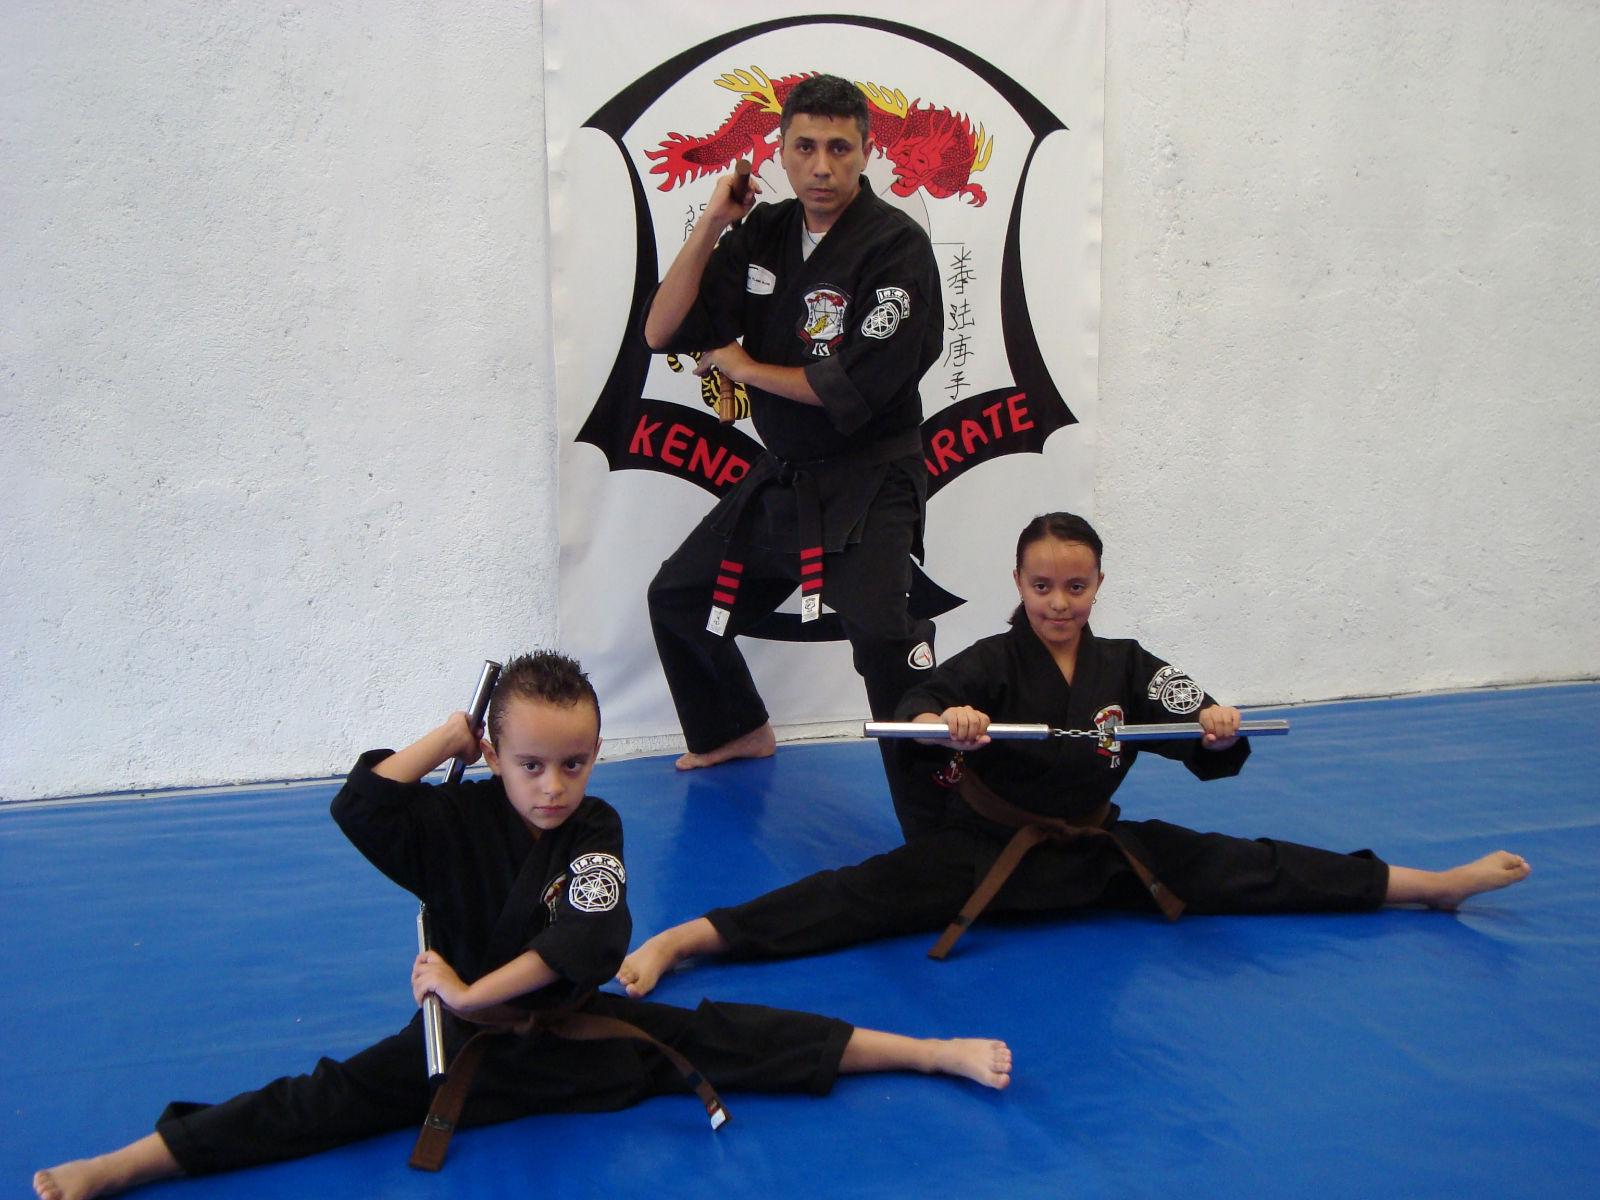 International Kenpo Karate Association   Morelia Mxico Just 1600x1200